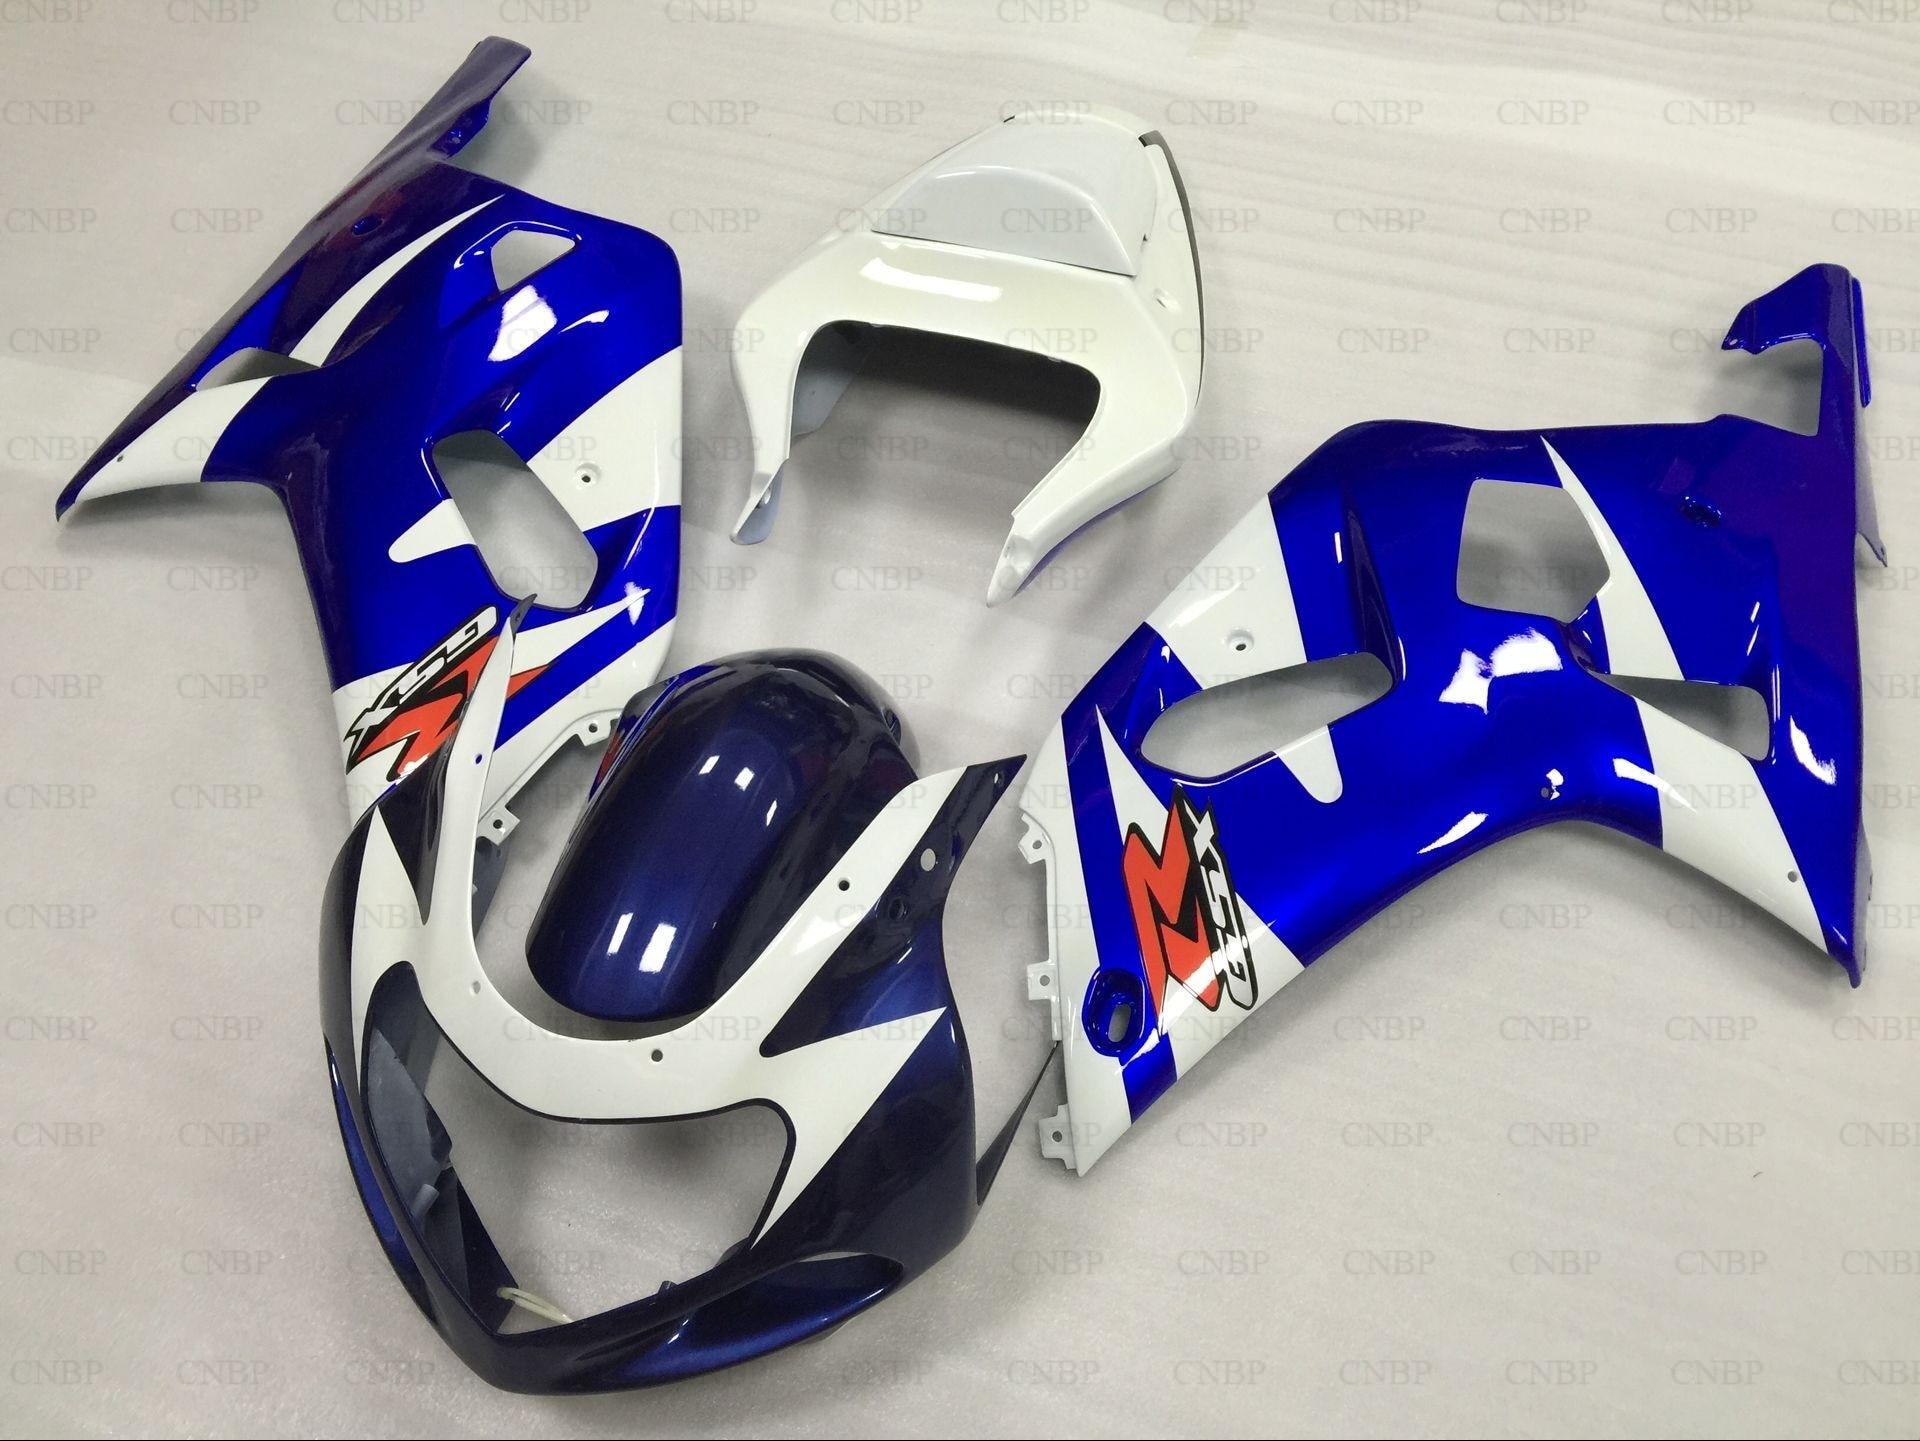 Fairing GSXR 600 750 1000 2002 Full Body Kits for Suzuki GSXR1000 2002 2000 - 2003 K1 K2 Blue White Fairing GSXR600 2002 аквариум на 600 1000 литров с рук